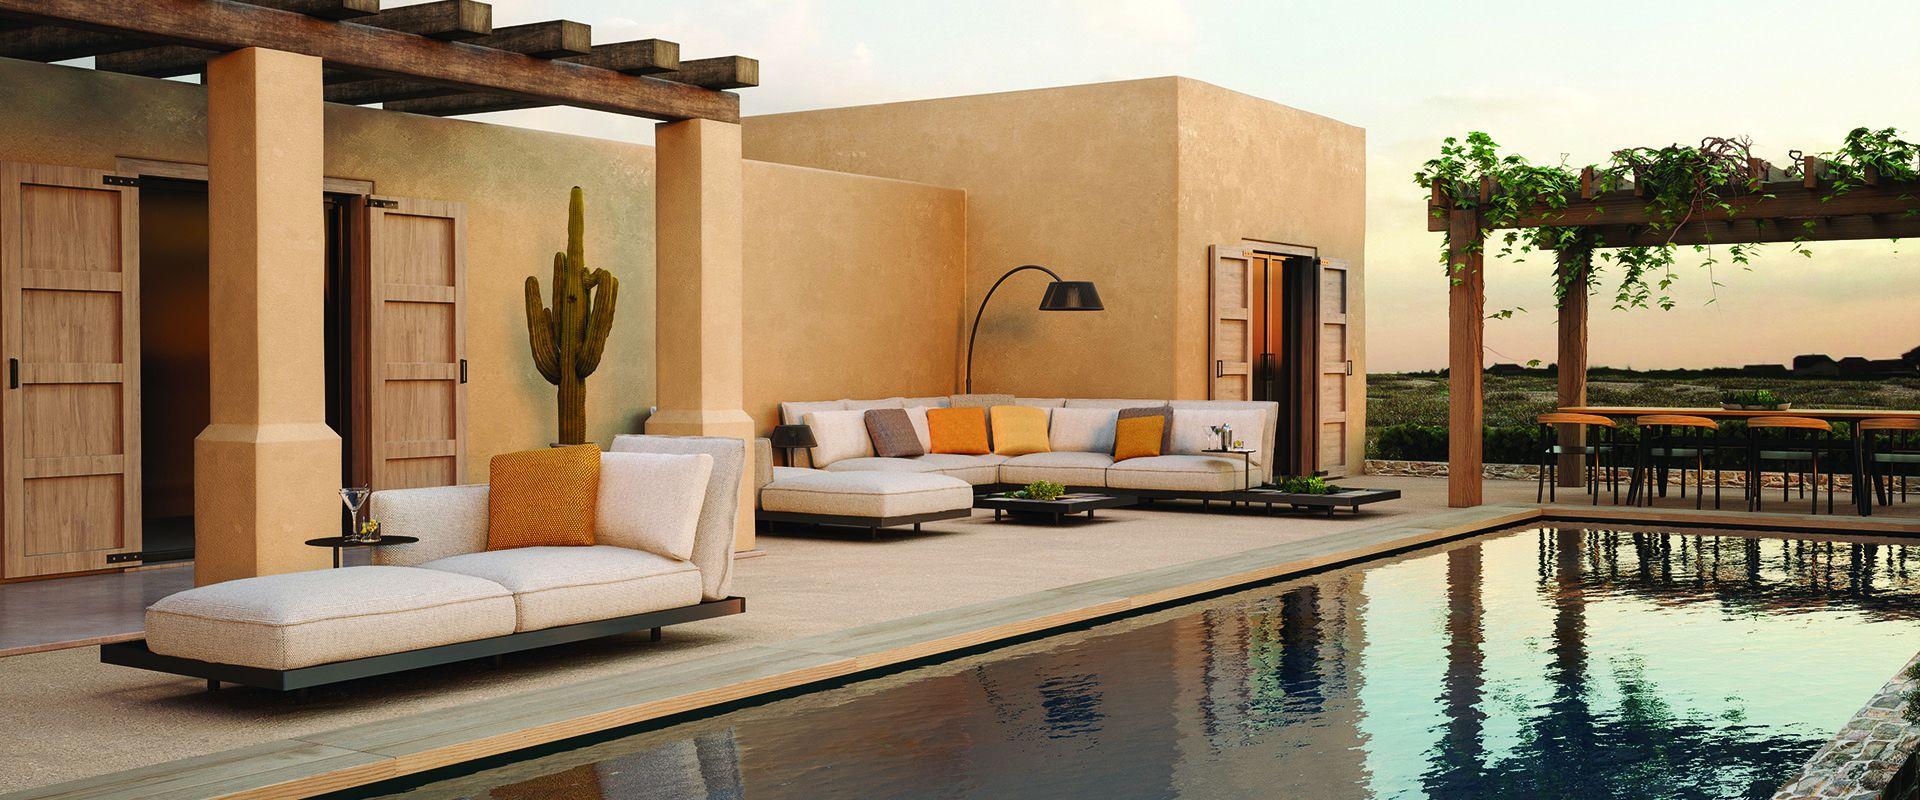 Mozaix Lounge Alu 03.jpg